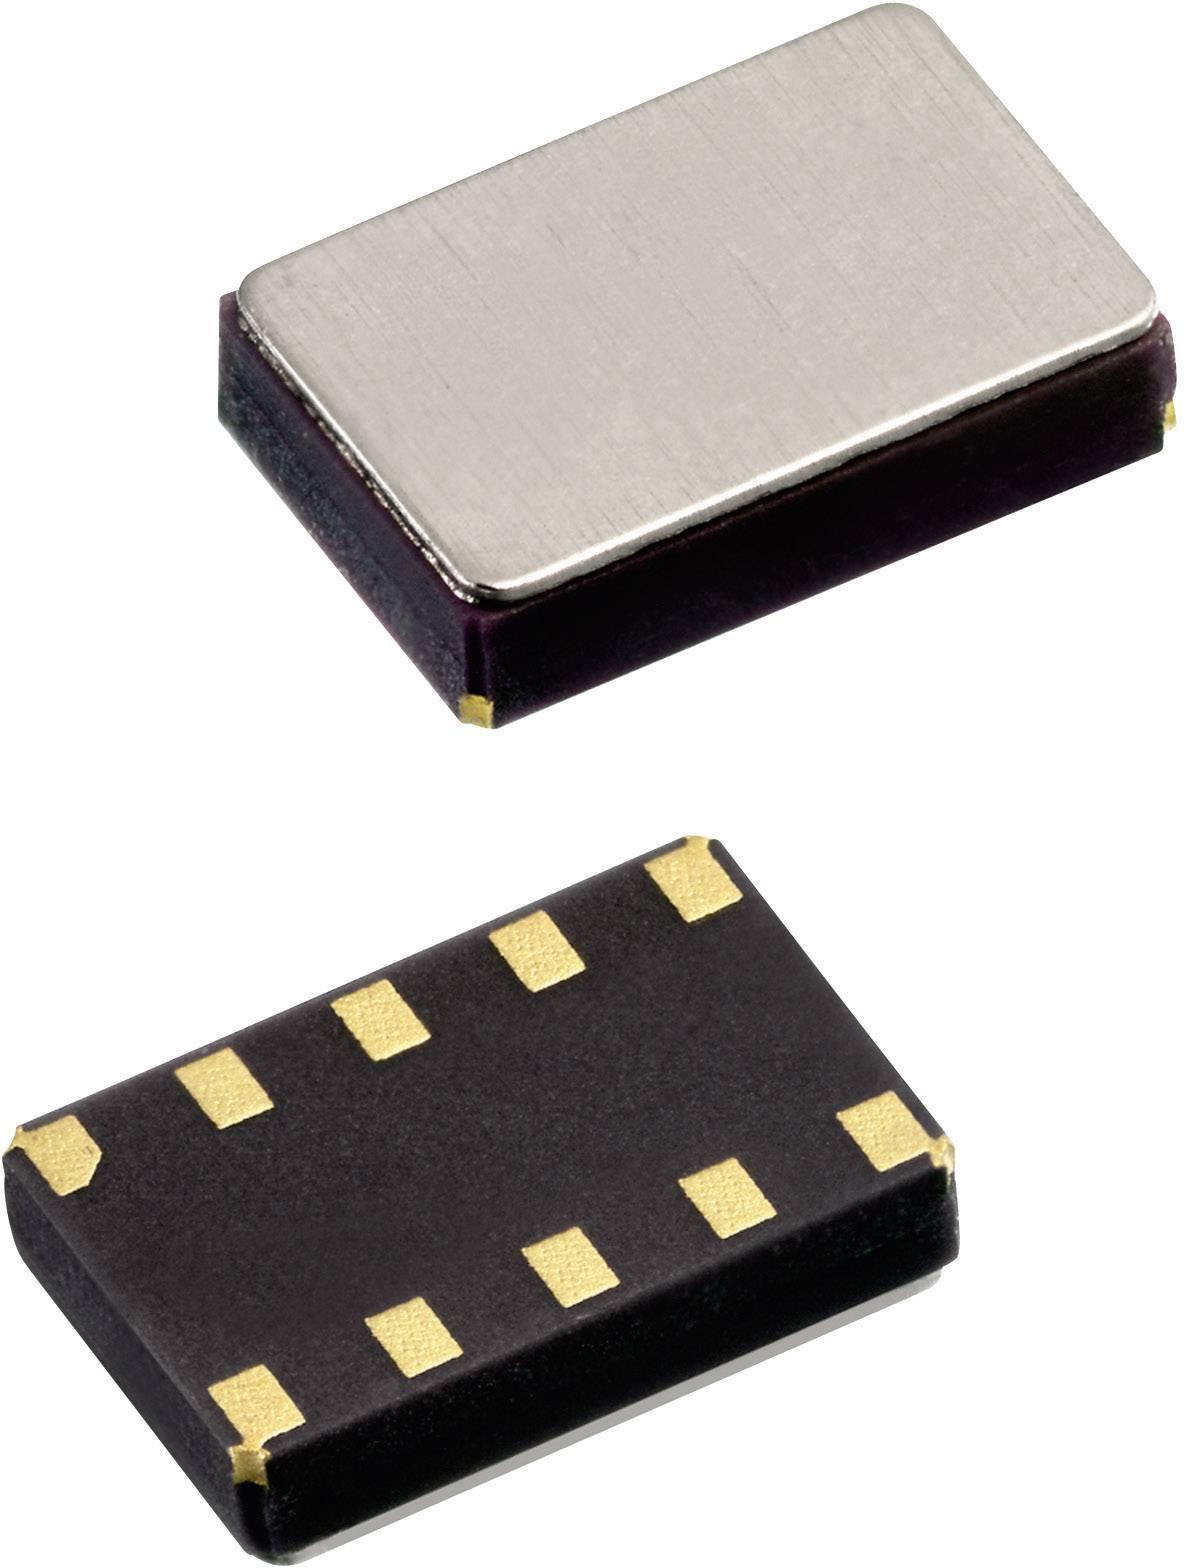 SMD krystal MicroCrystal, RV-3049-C3-TA Option B